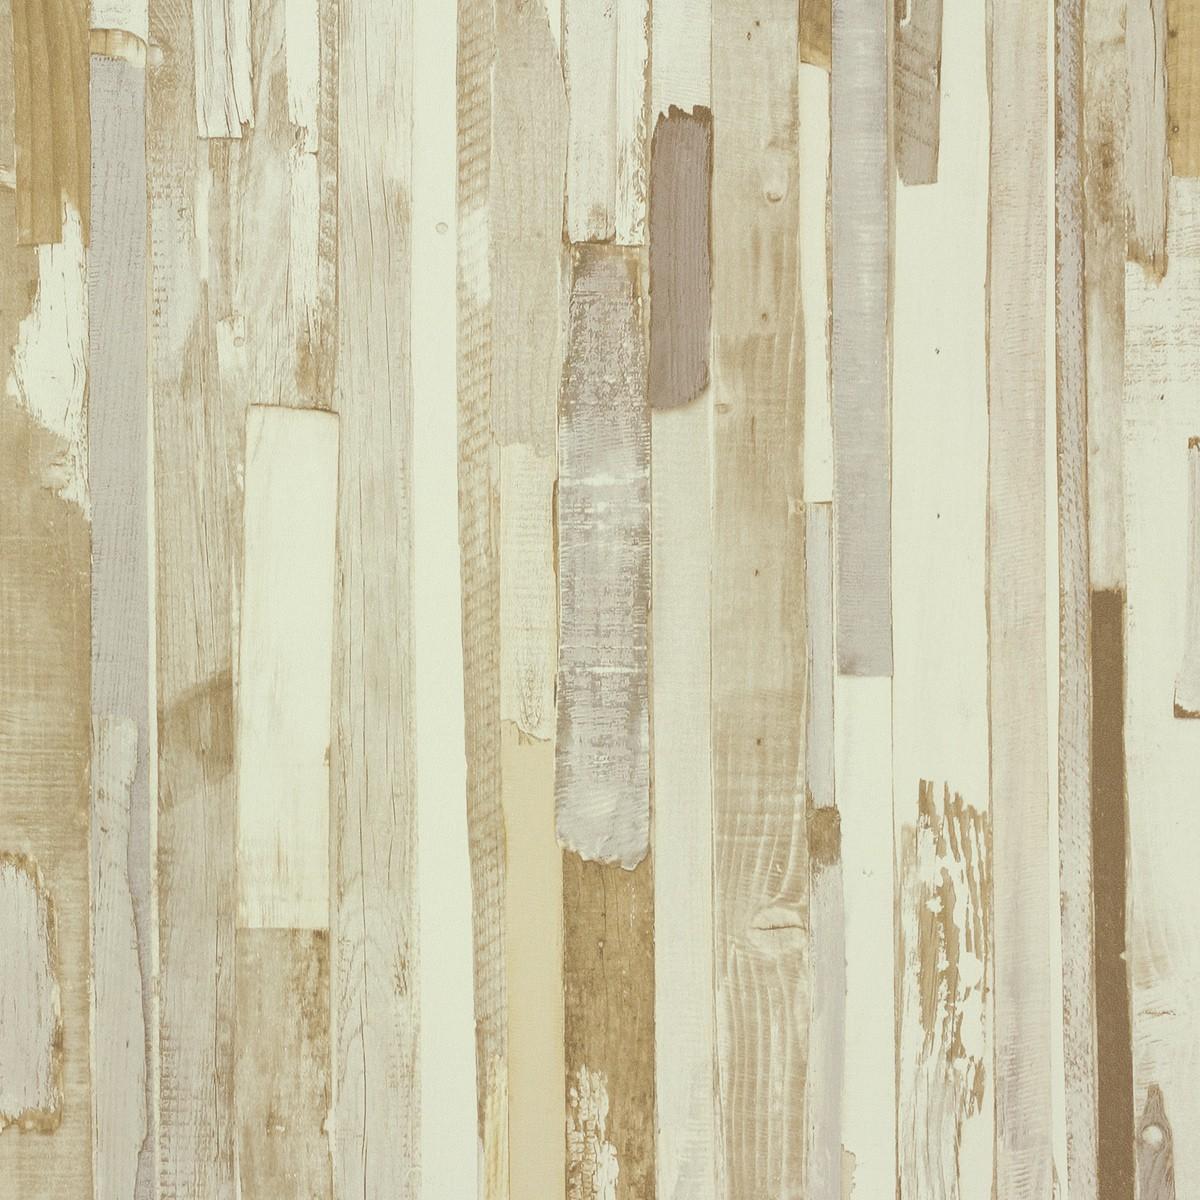 Tapeten Holzoptik Vintage : Rasch Textil 255422 Streifen Grau Meliert Tapeten Vintage on Pinterest